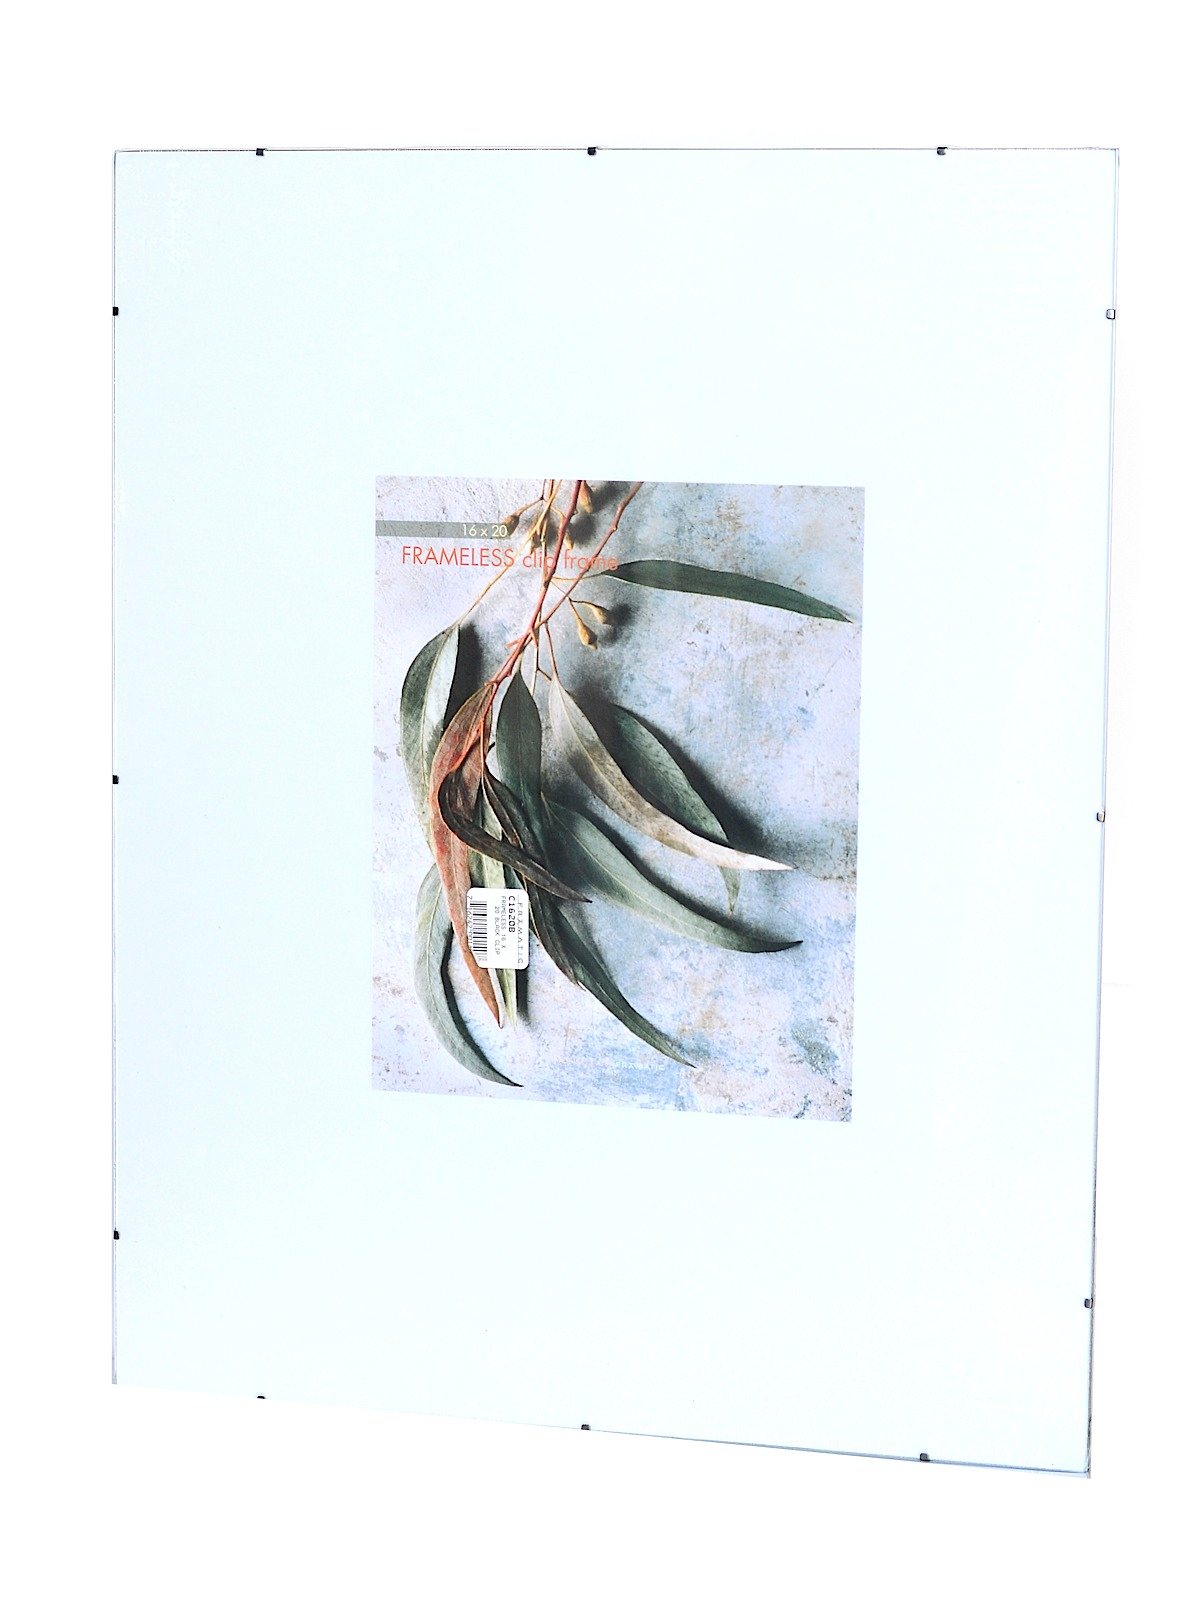 Framatic Frameless Clip Frames | MisterArt.com